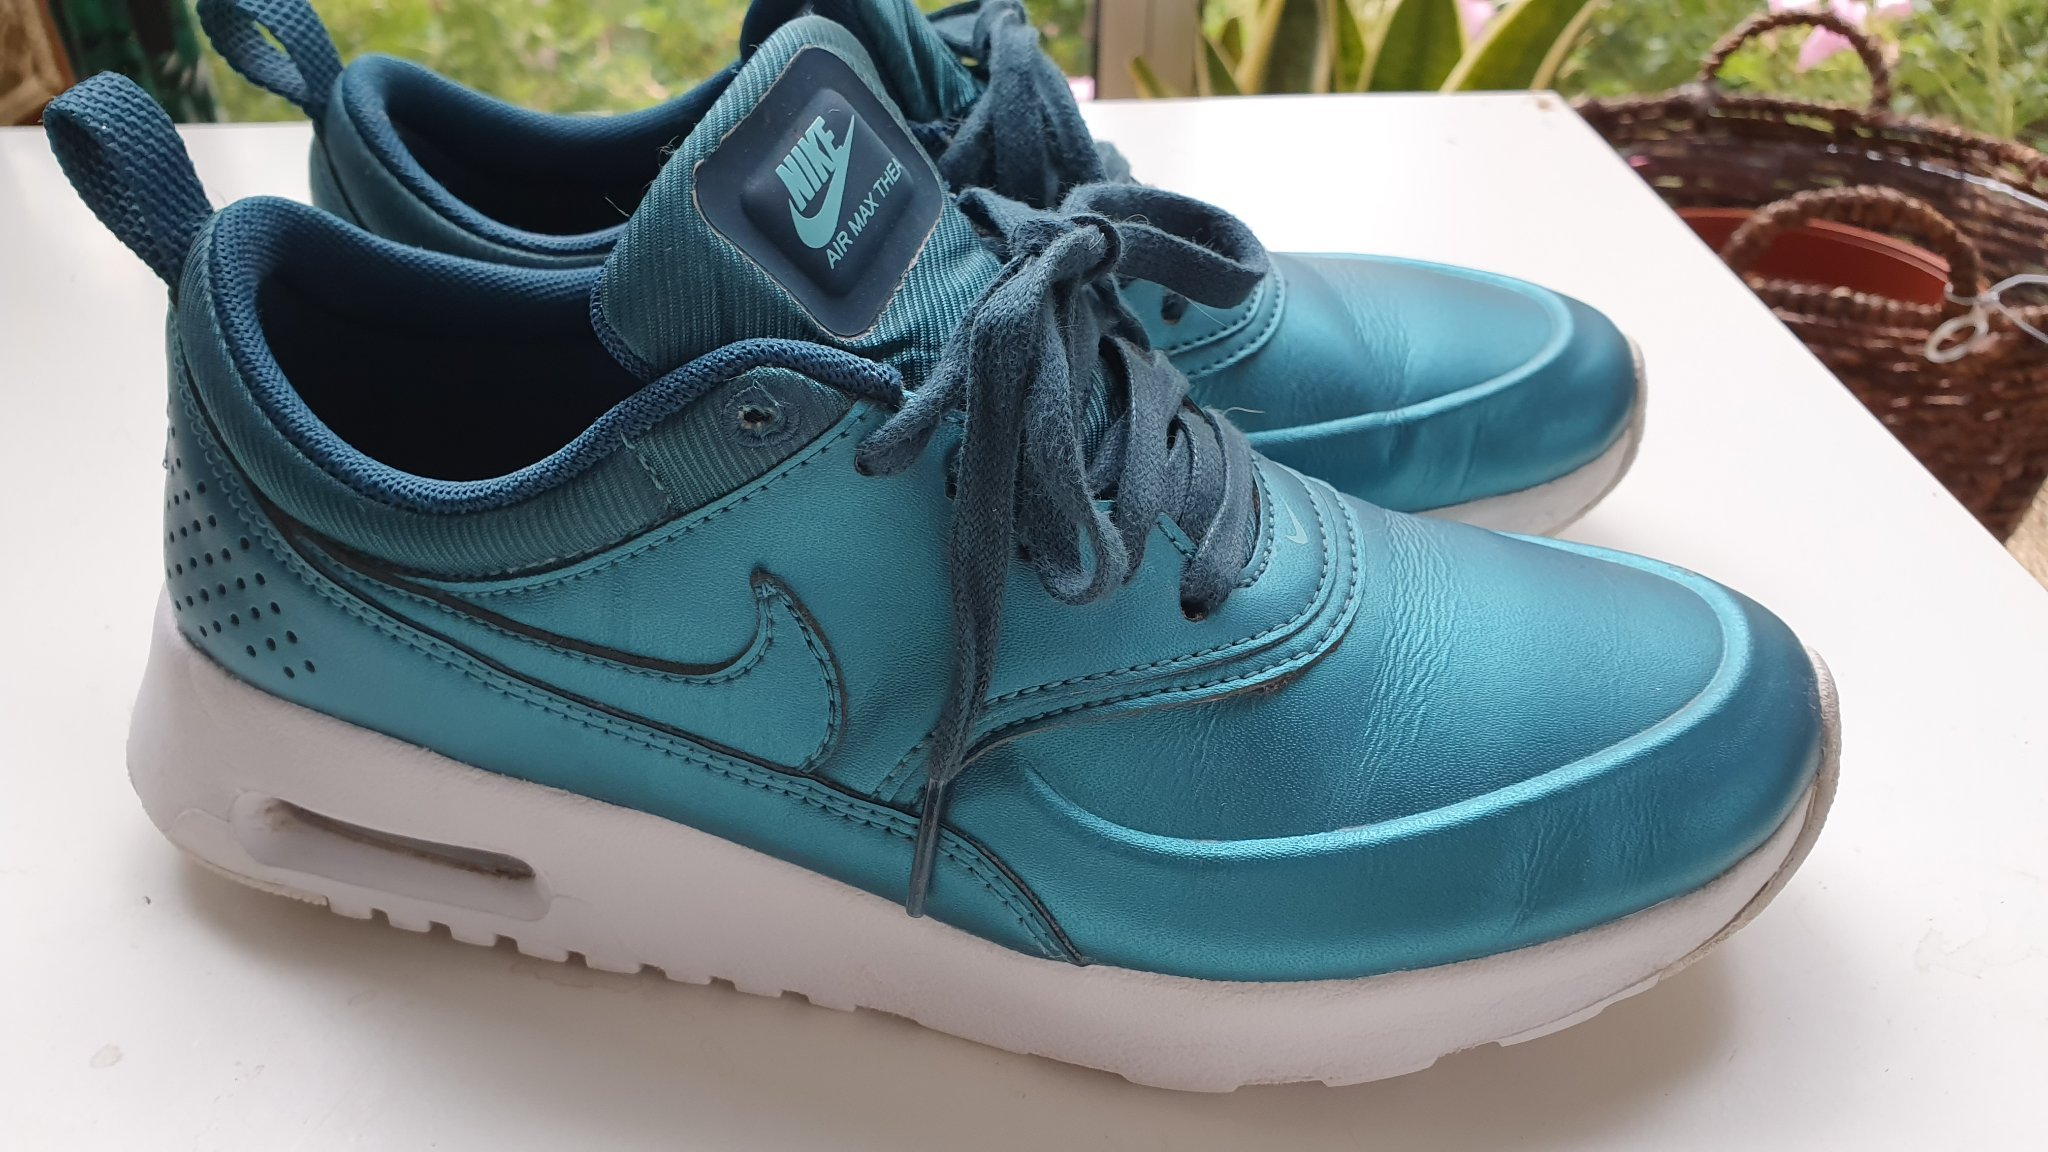 Nike Air Max Thea Teal Green Metallic Sneaker NWT